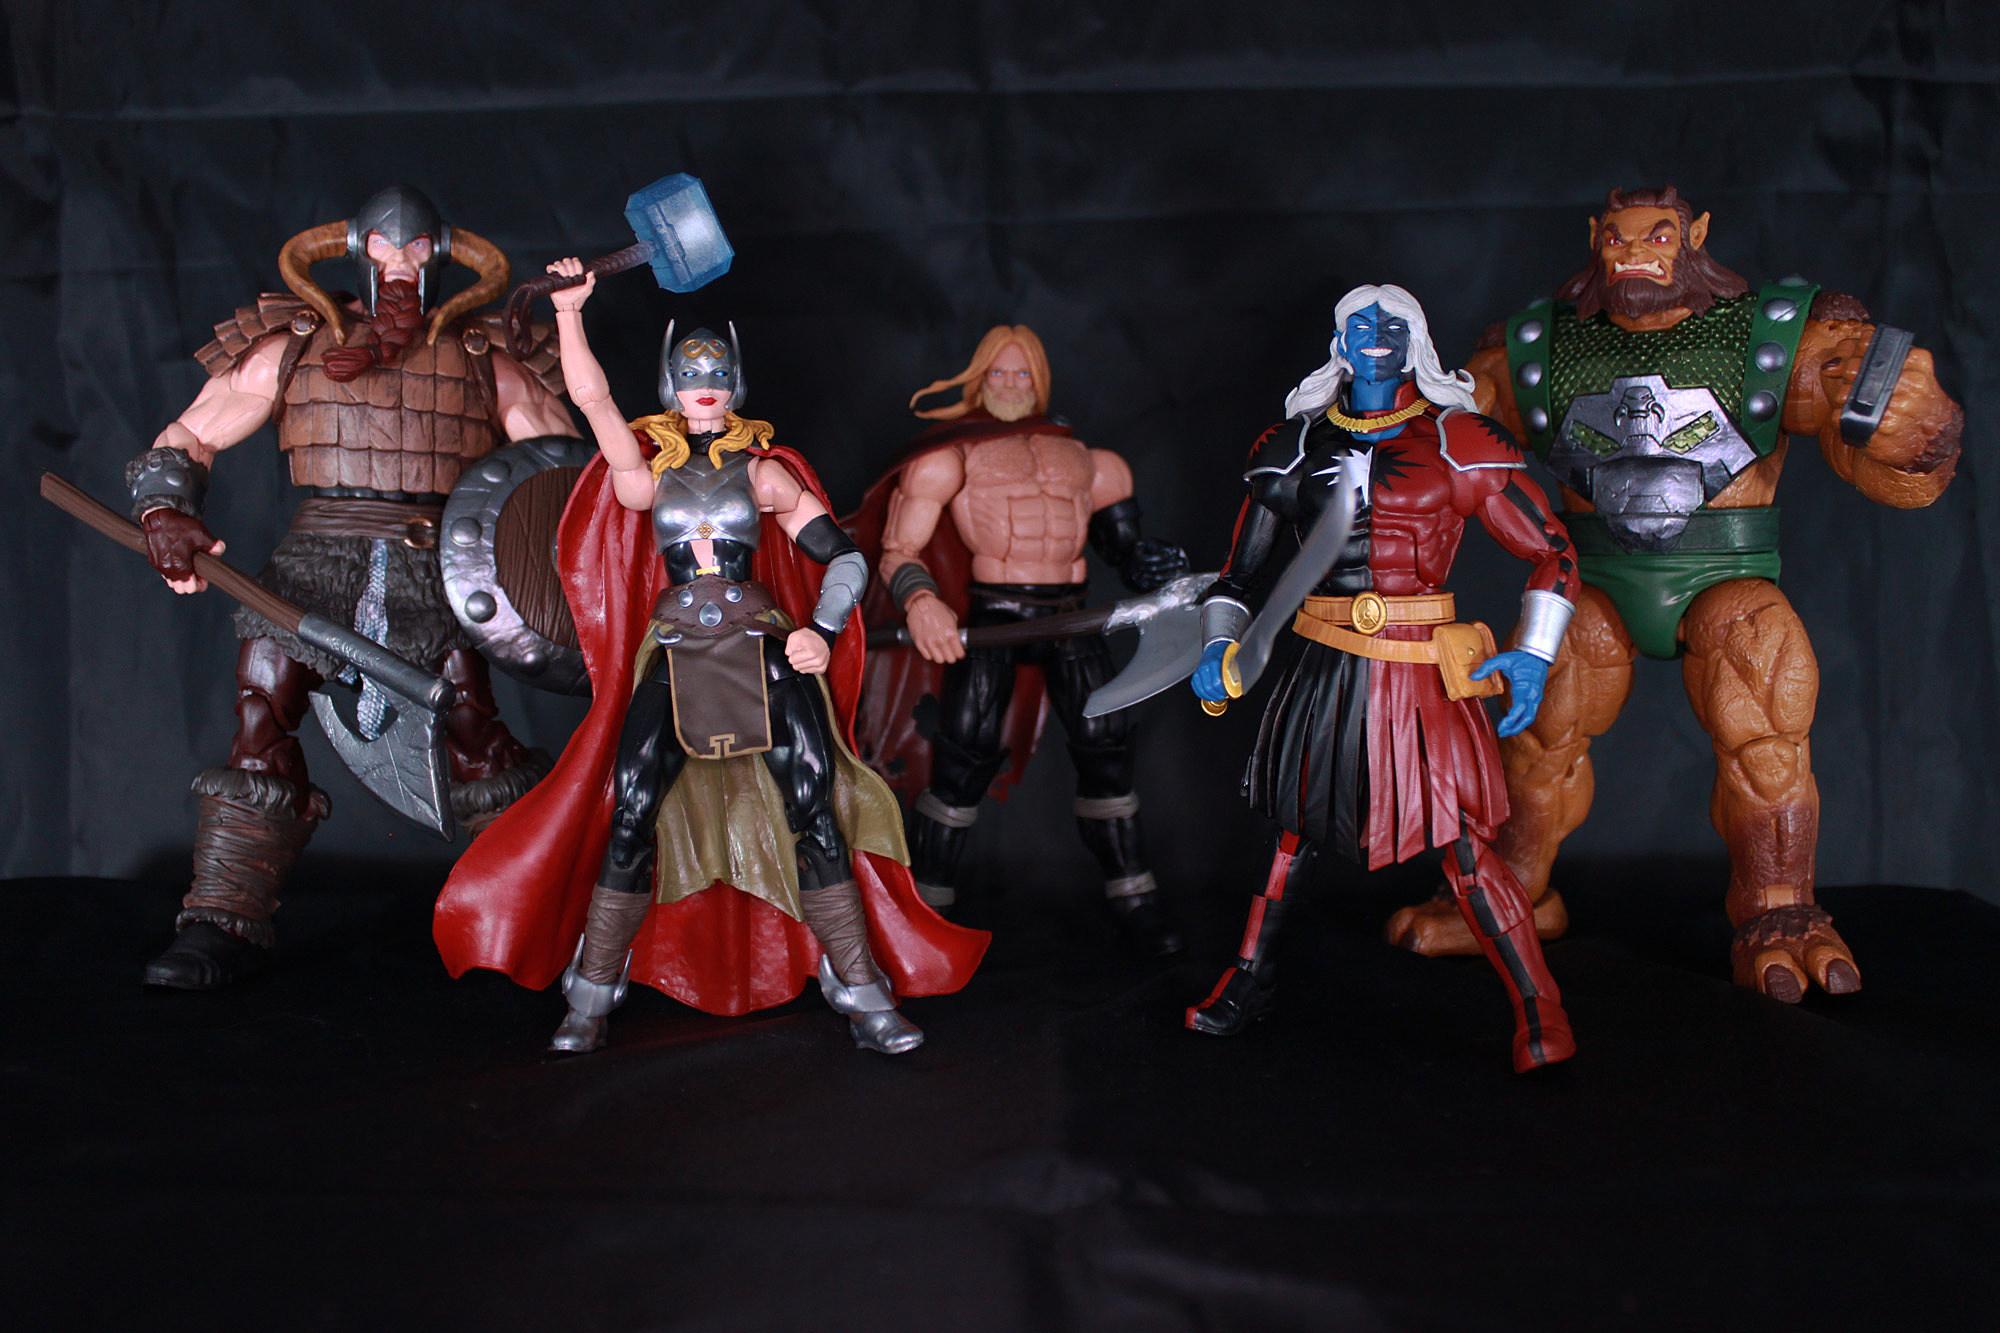 San Diego comic-con 2017 Hasbro Exclusive Thor Ragnarok Marvel Legends BATTLE FOR ASGARD Pack de 5